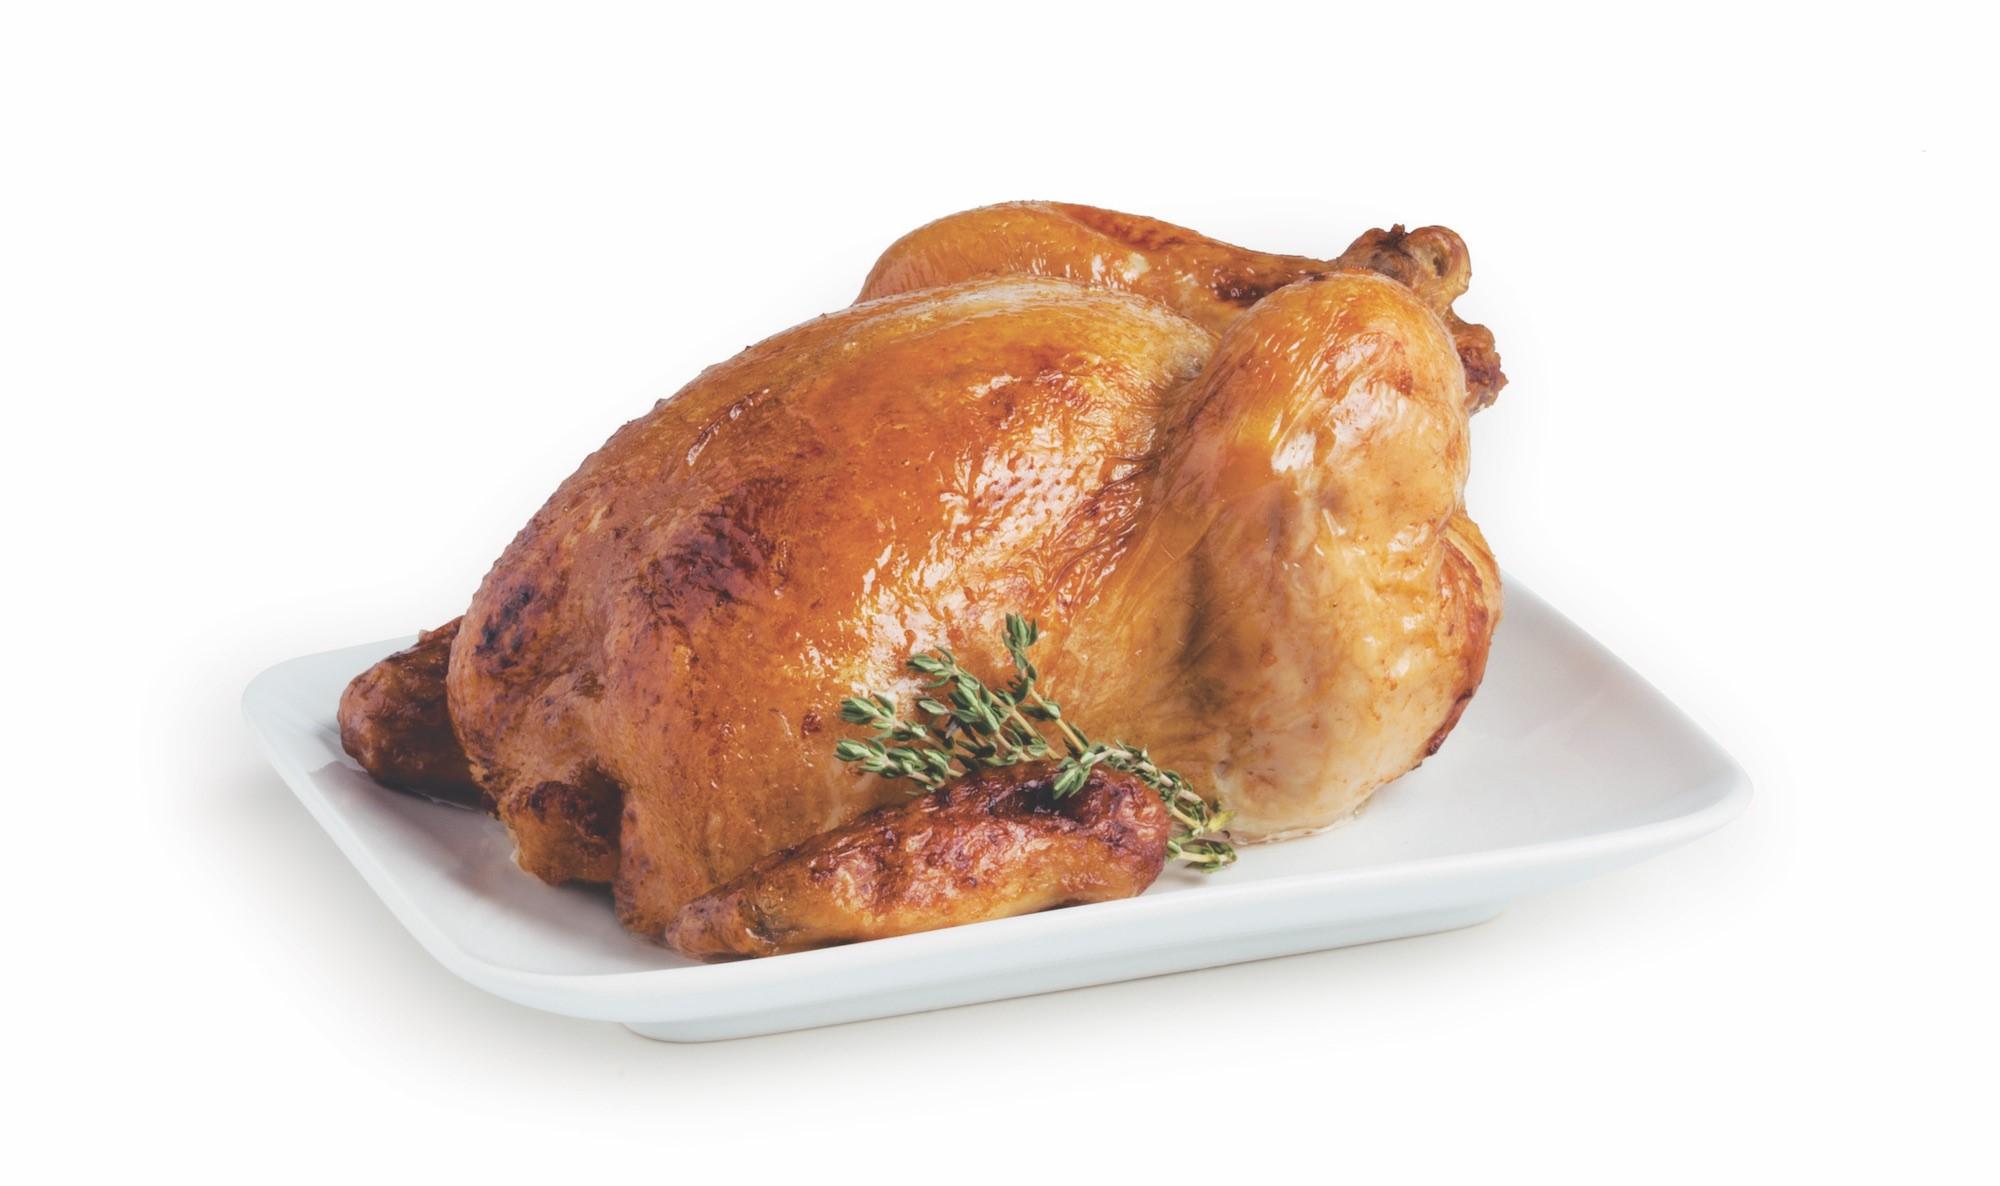 Rotisserie Chicken with Thyme Sprigs